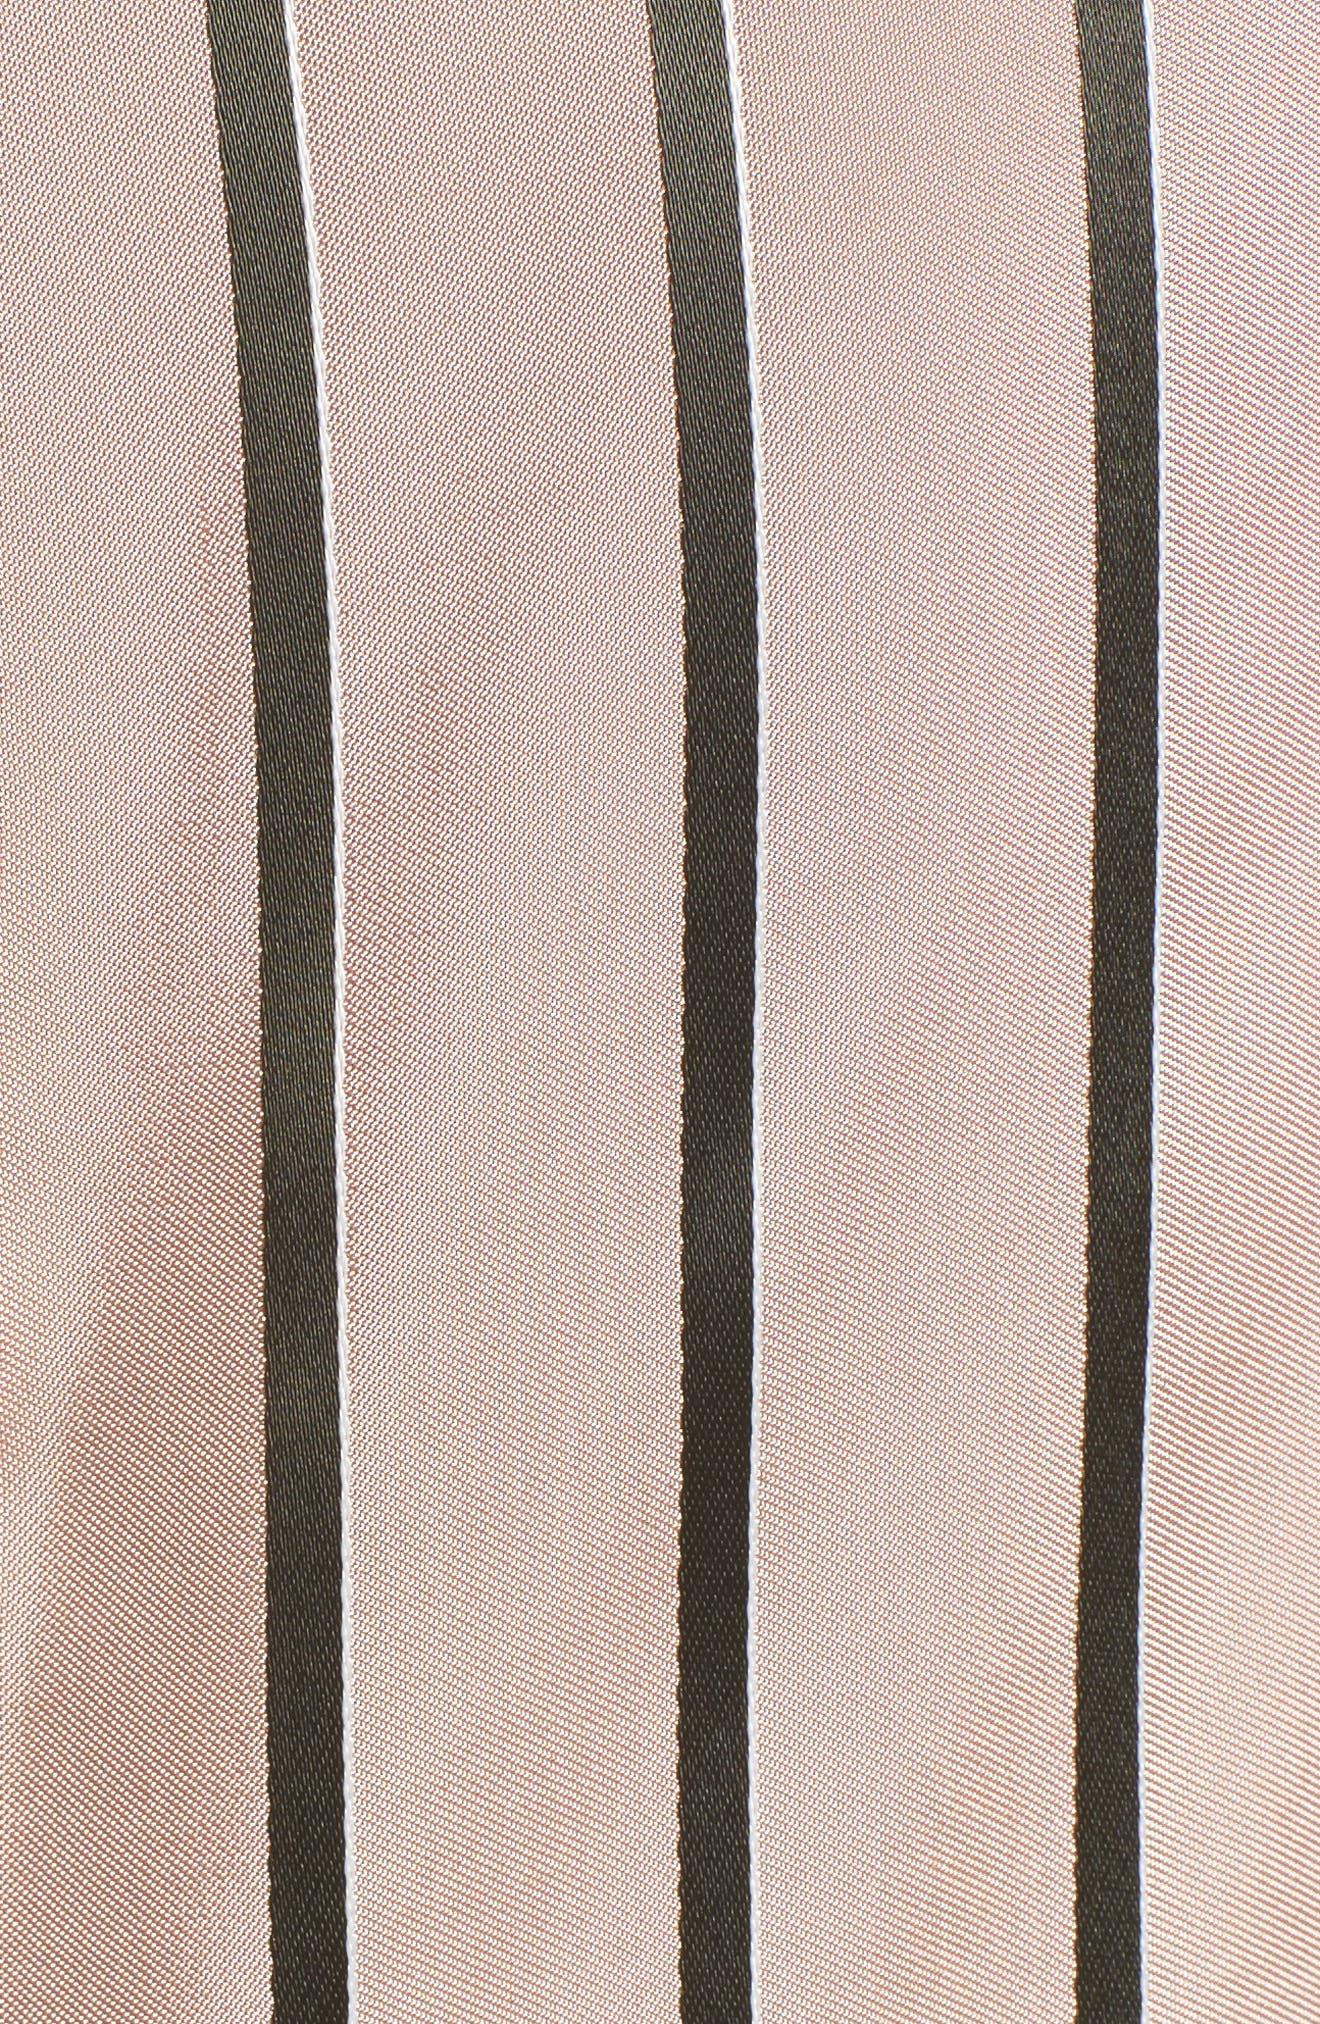 Cosway Dress,                             Alternate thumbnail 5, color,                             Salmon